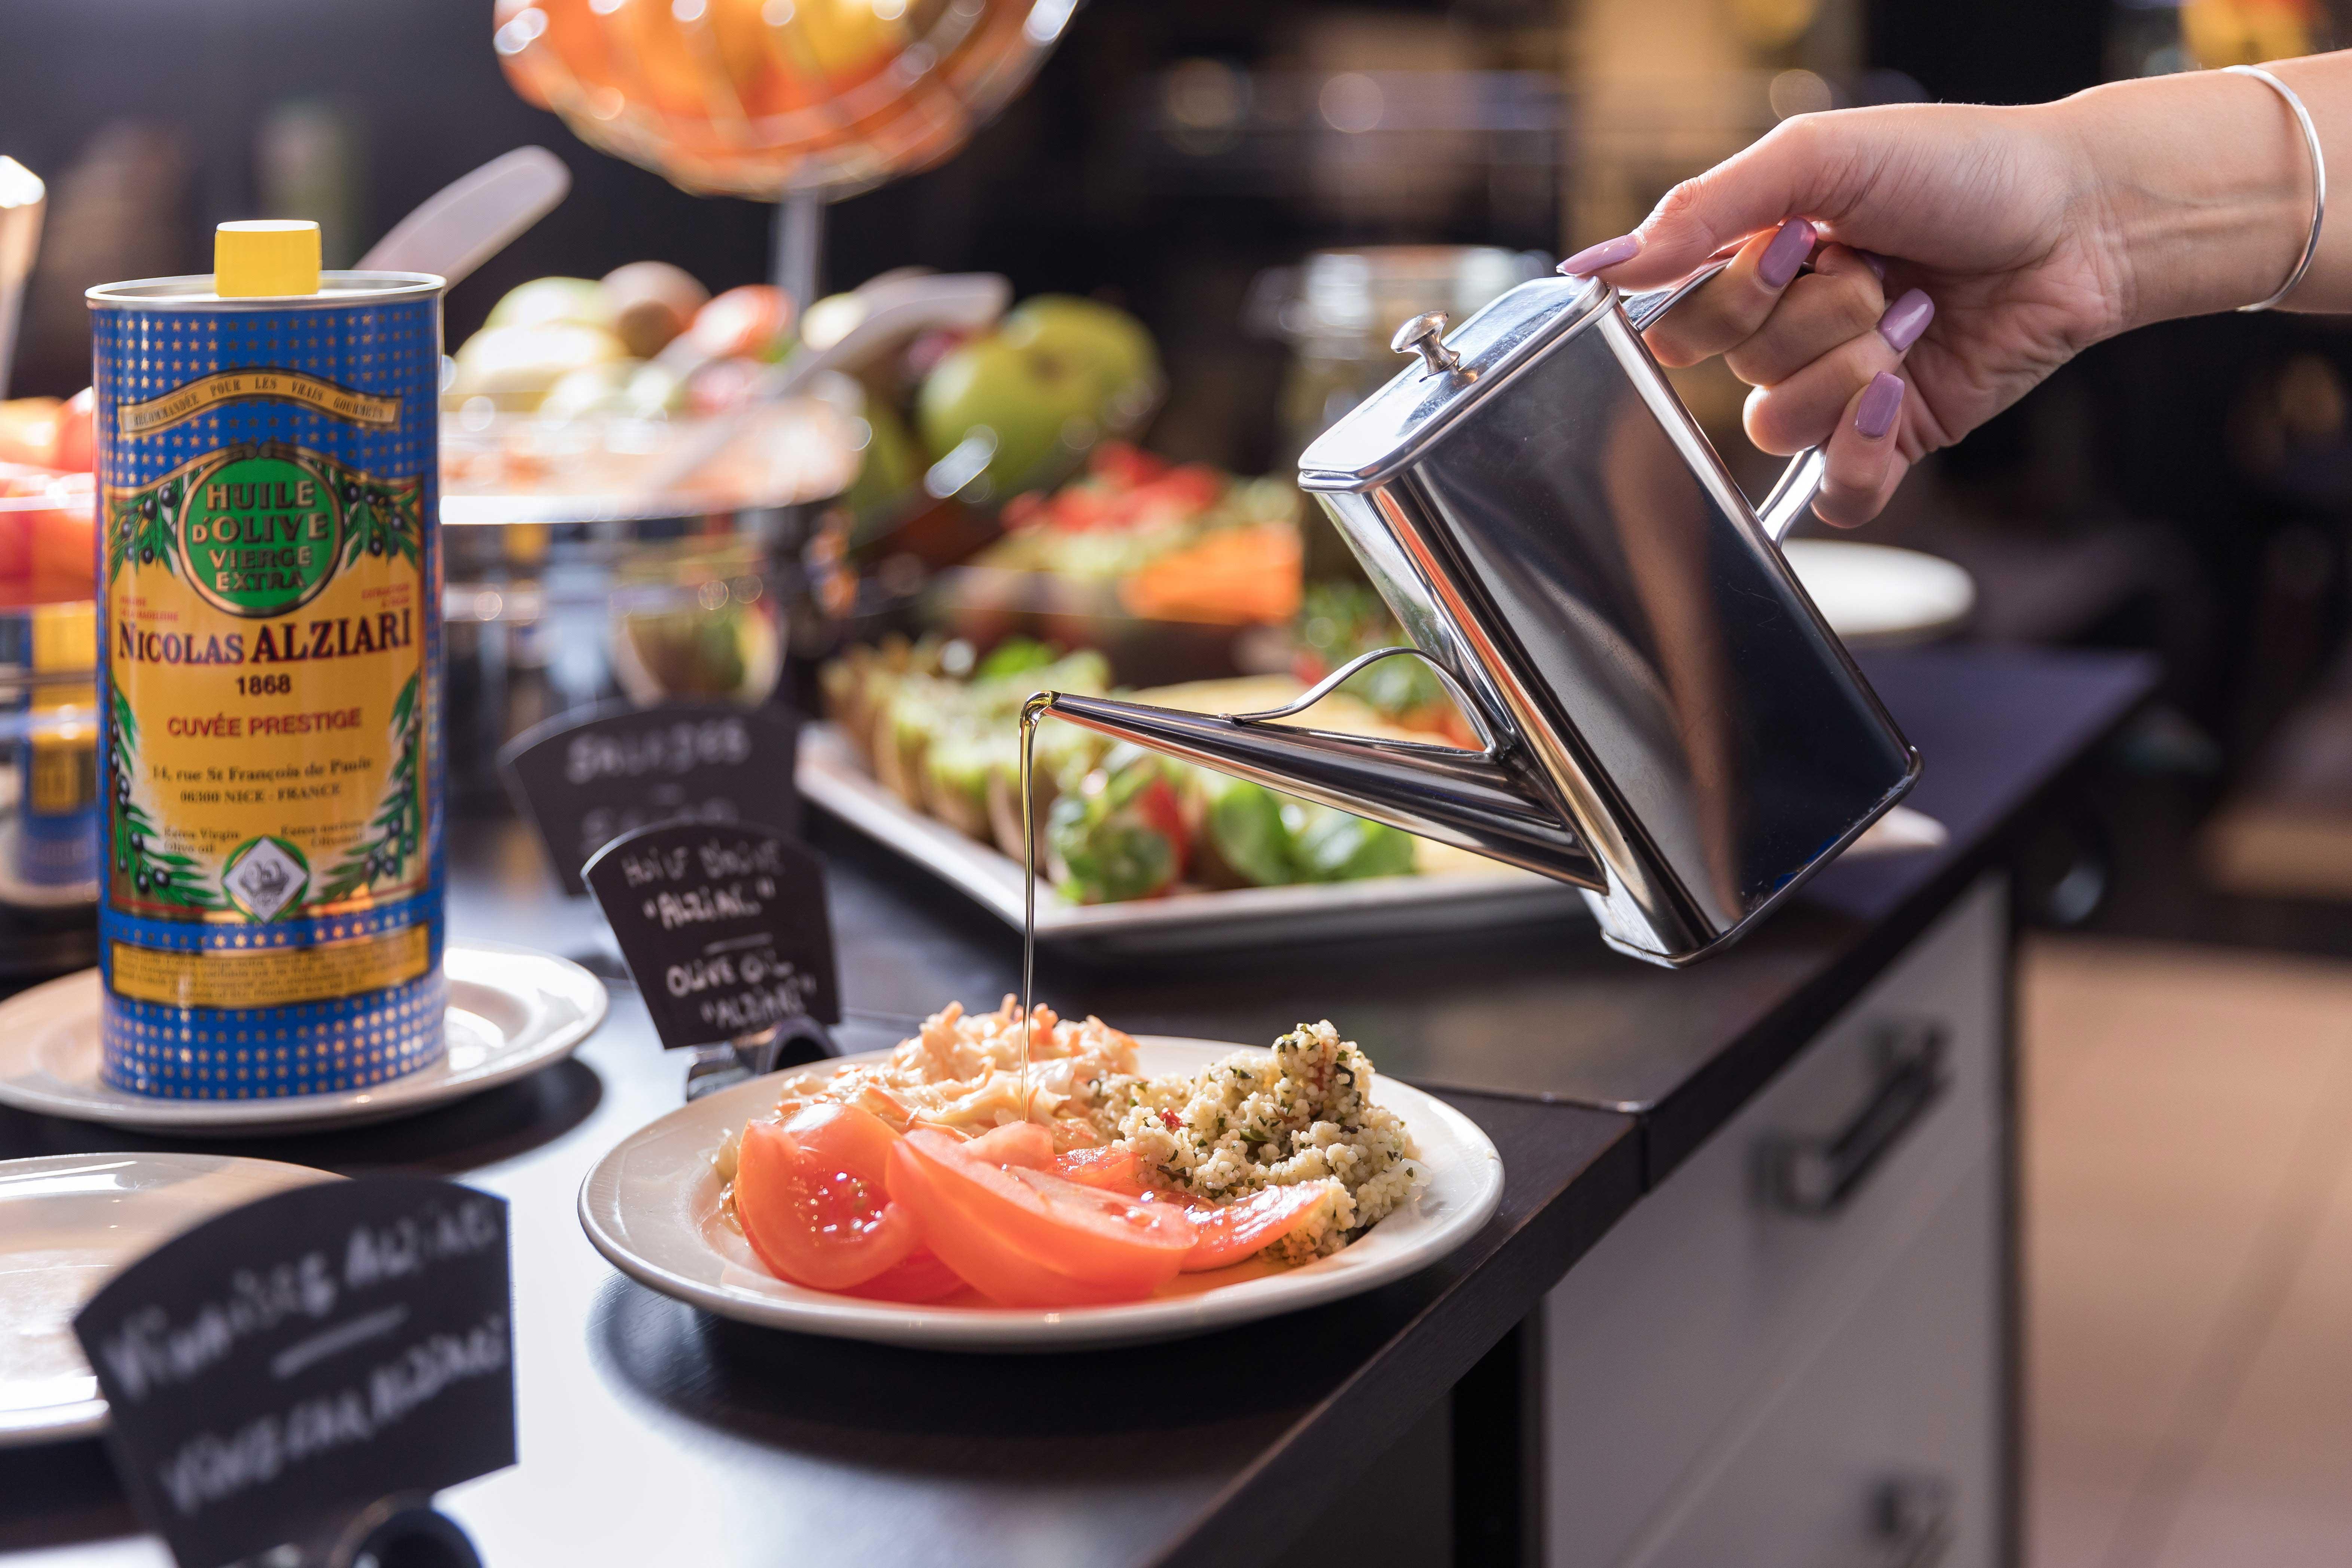 Nicolas Alziari olive oil - Credit Summer Hotels